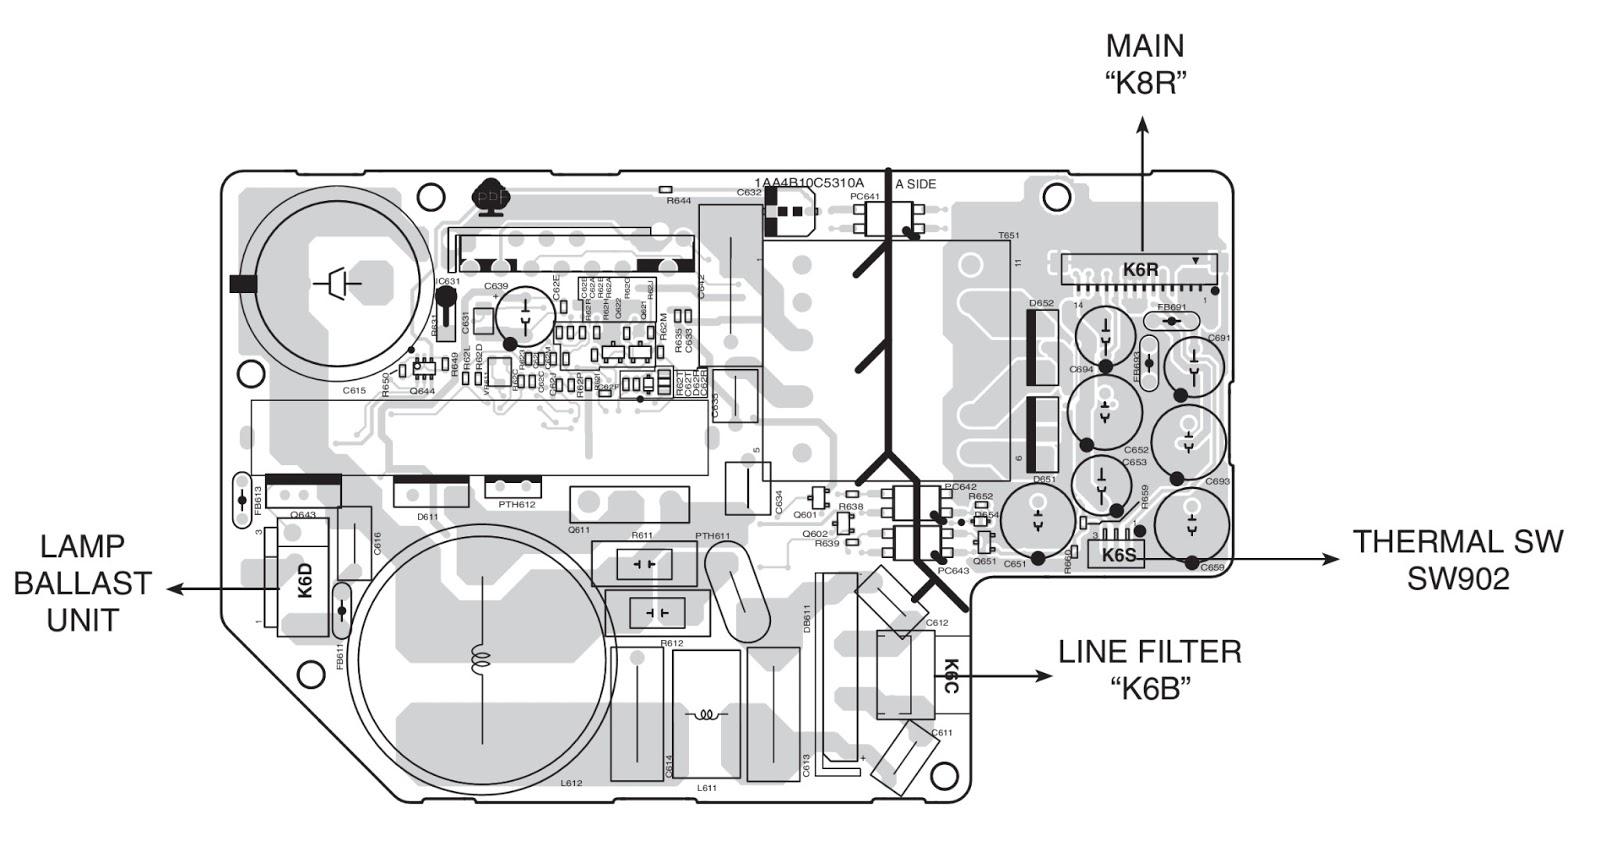 dell power supply wiring diagram sanyo power supply wiring diagram sanyo plc xu87 projector - power supply - schematic ...